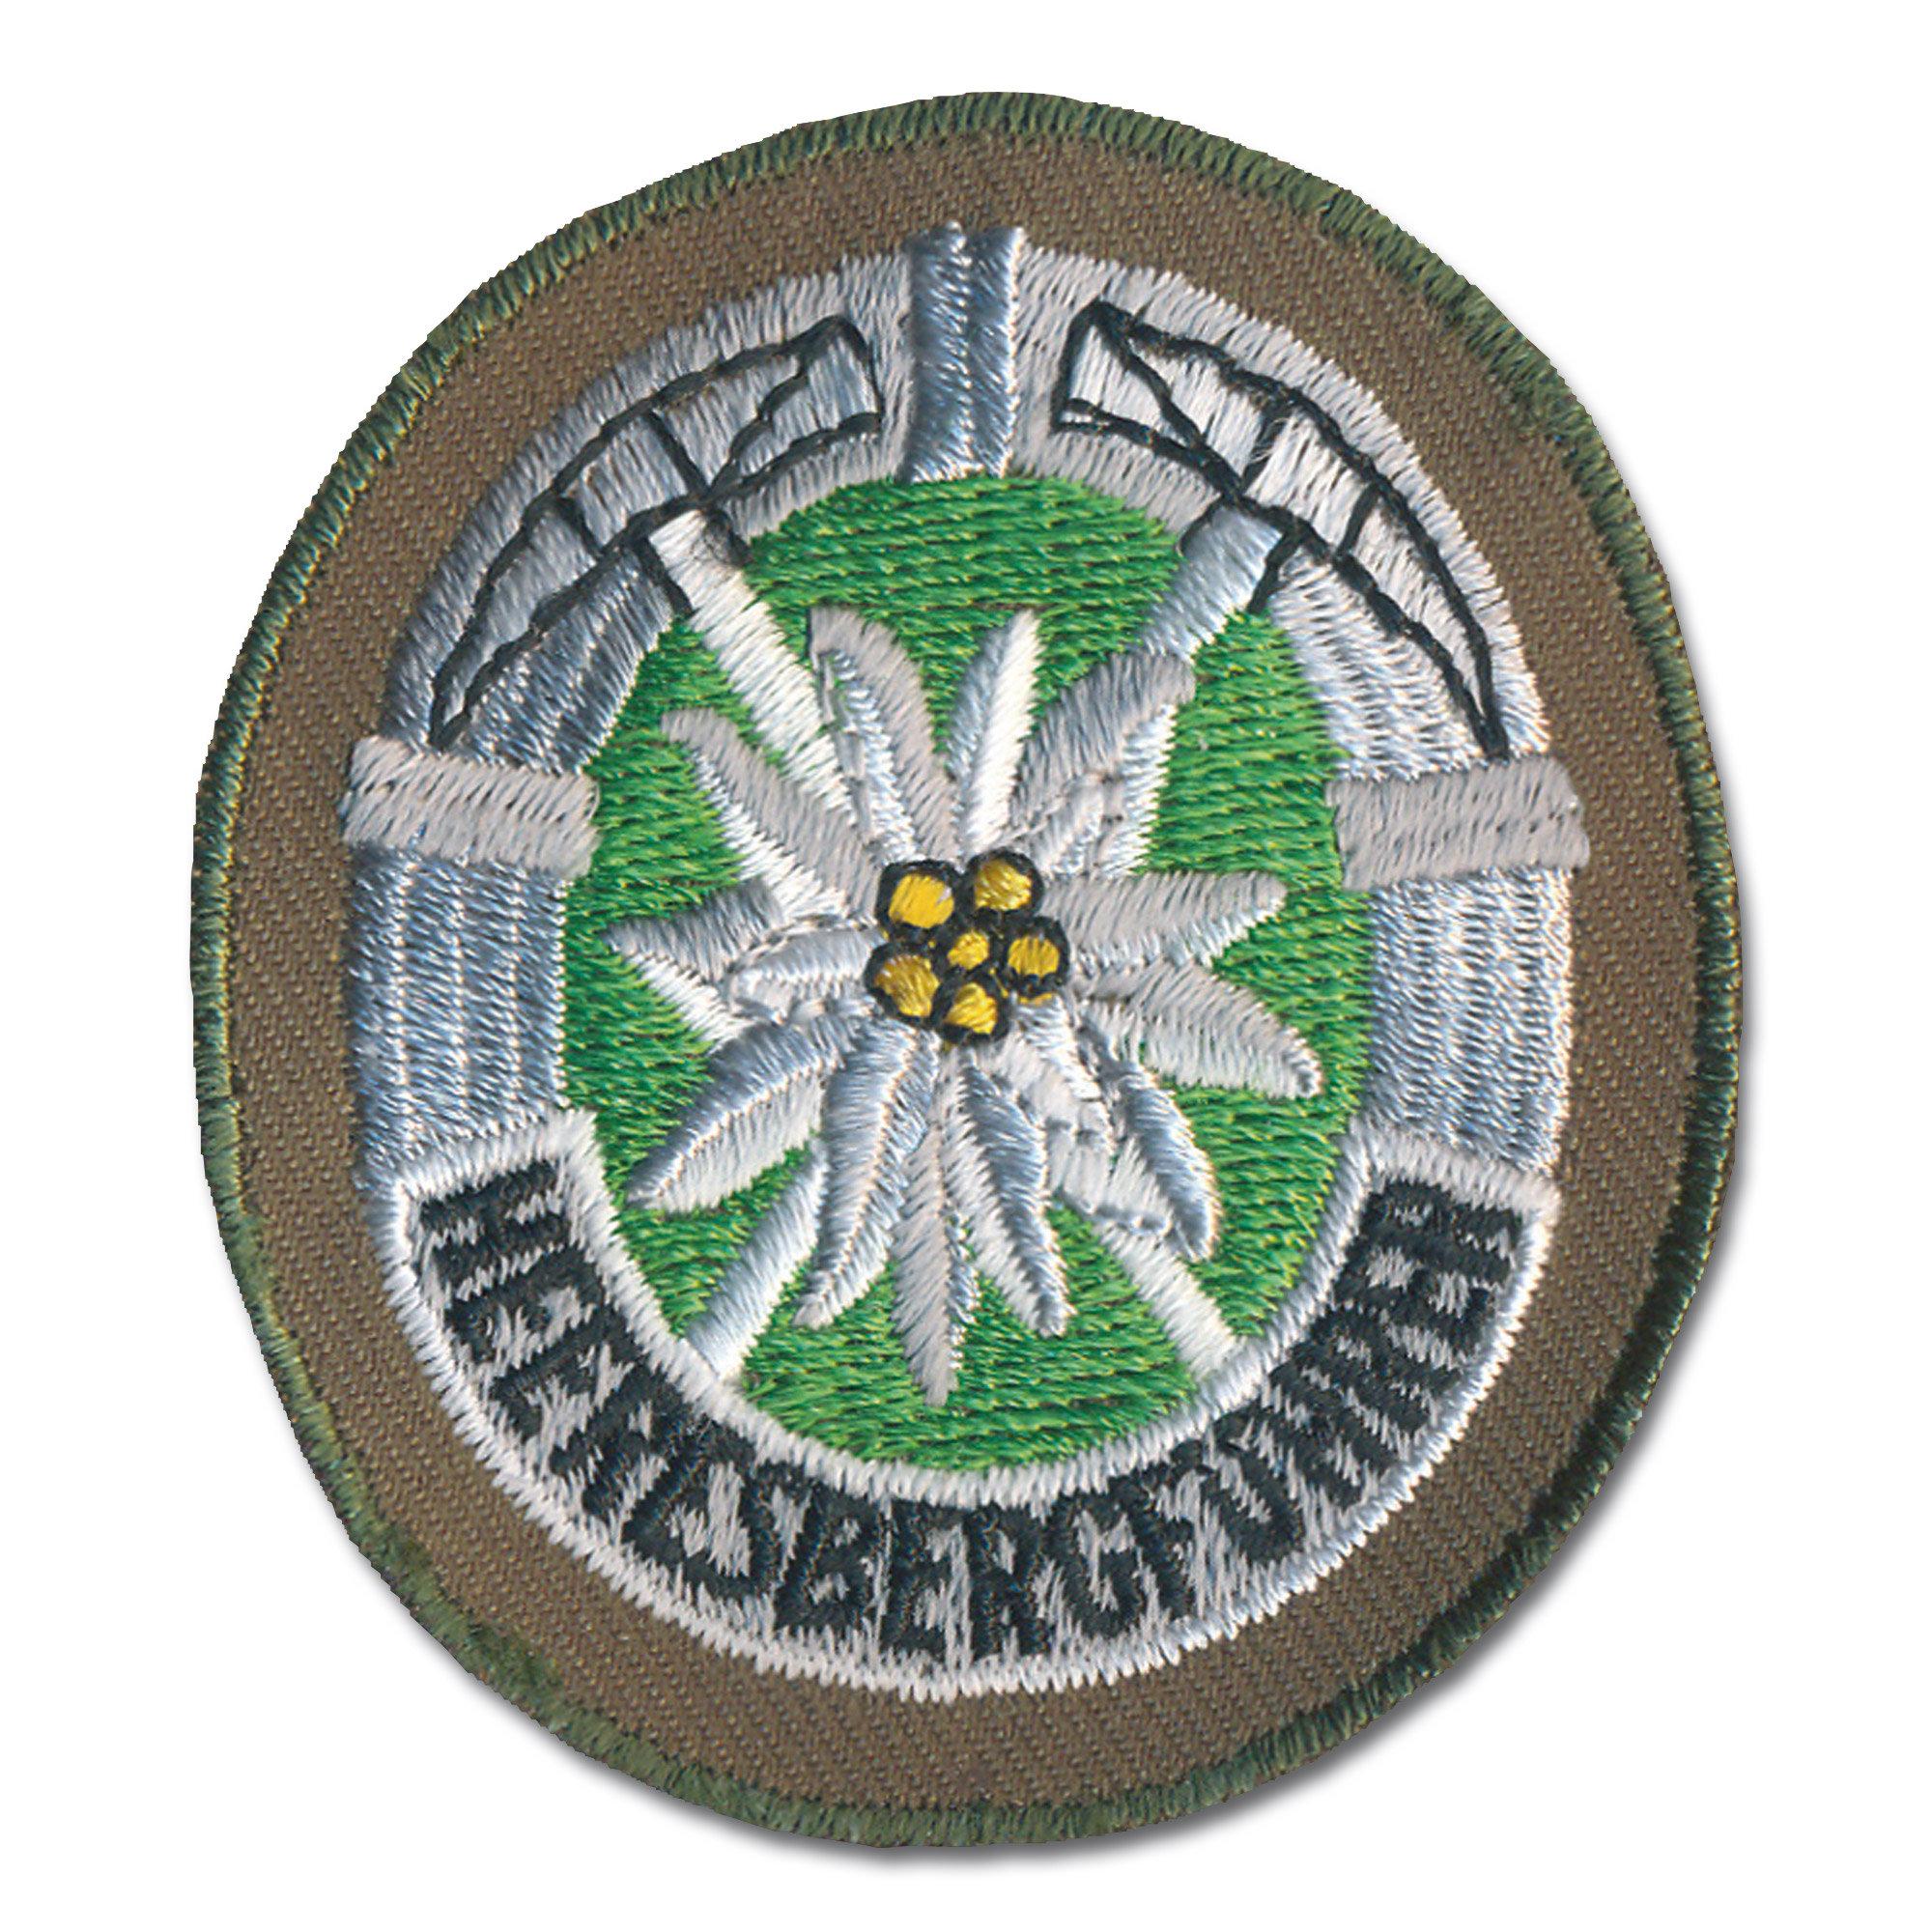 Distintivo Bw Heeresbergführer verde oliva